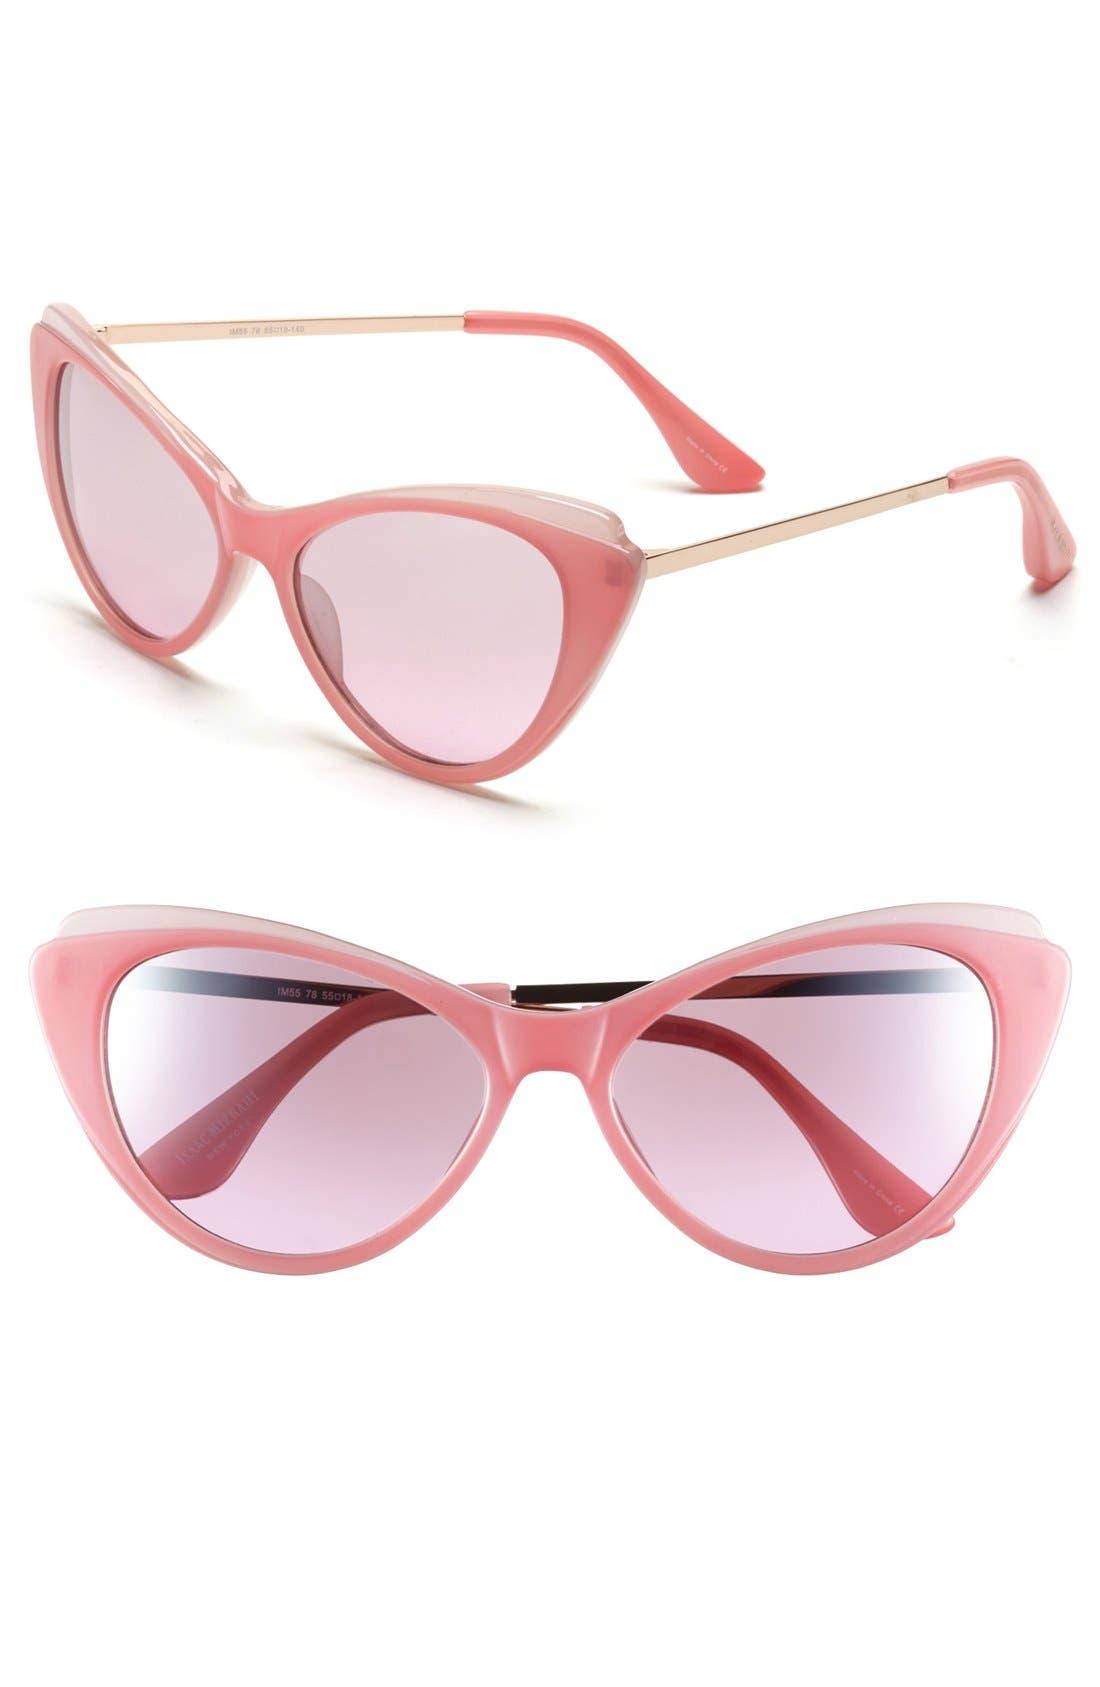 57mm Cat Eye Sunglasses,                         Main,                         color, Blush